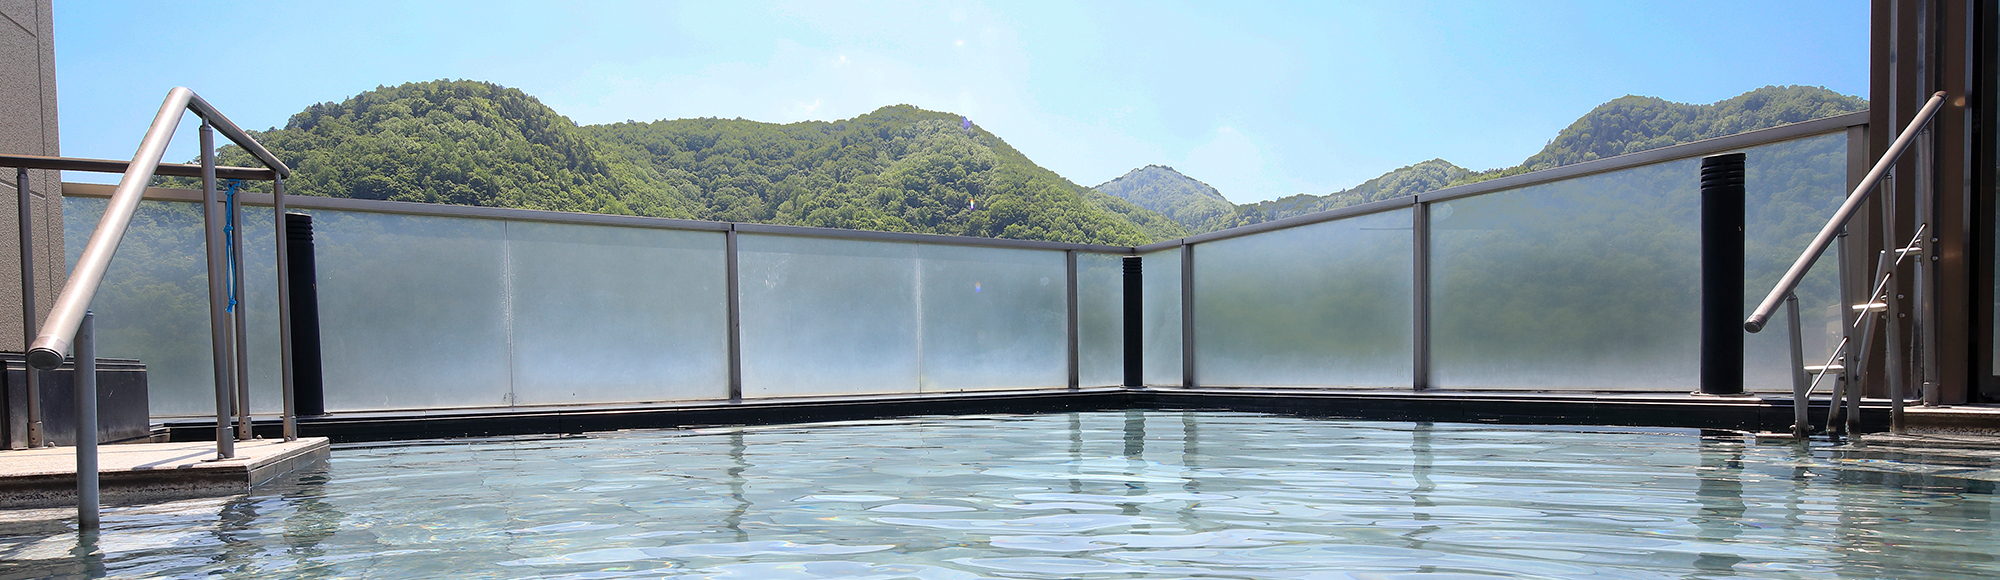 Jozankei View Hotel Official Website, Hokkaido Jozankei Hot Spring